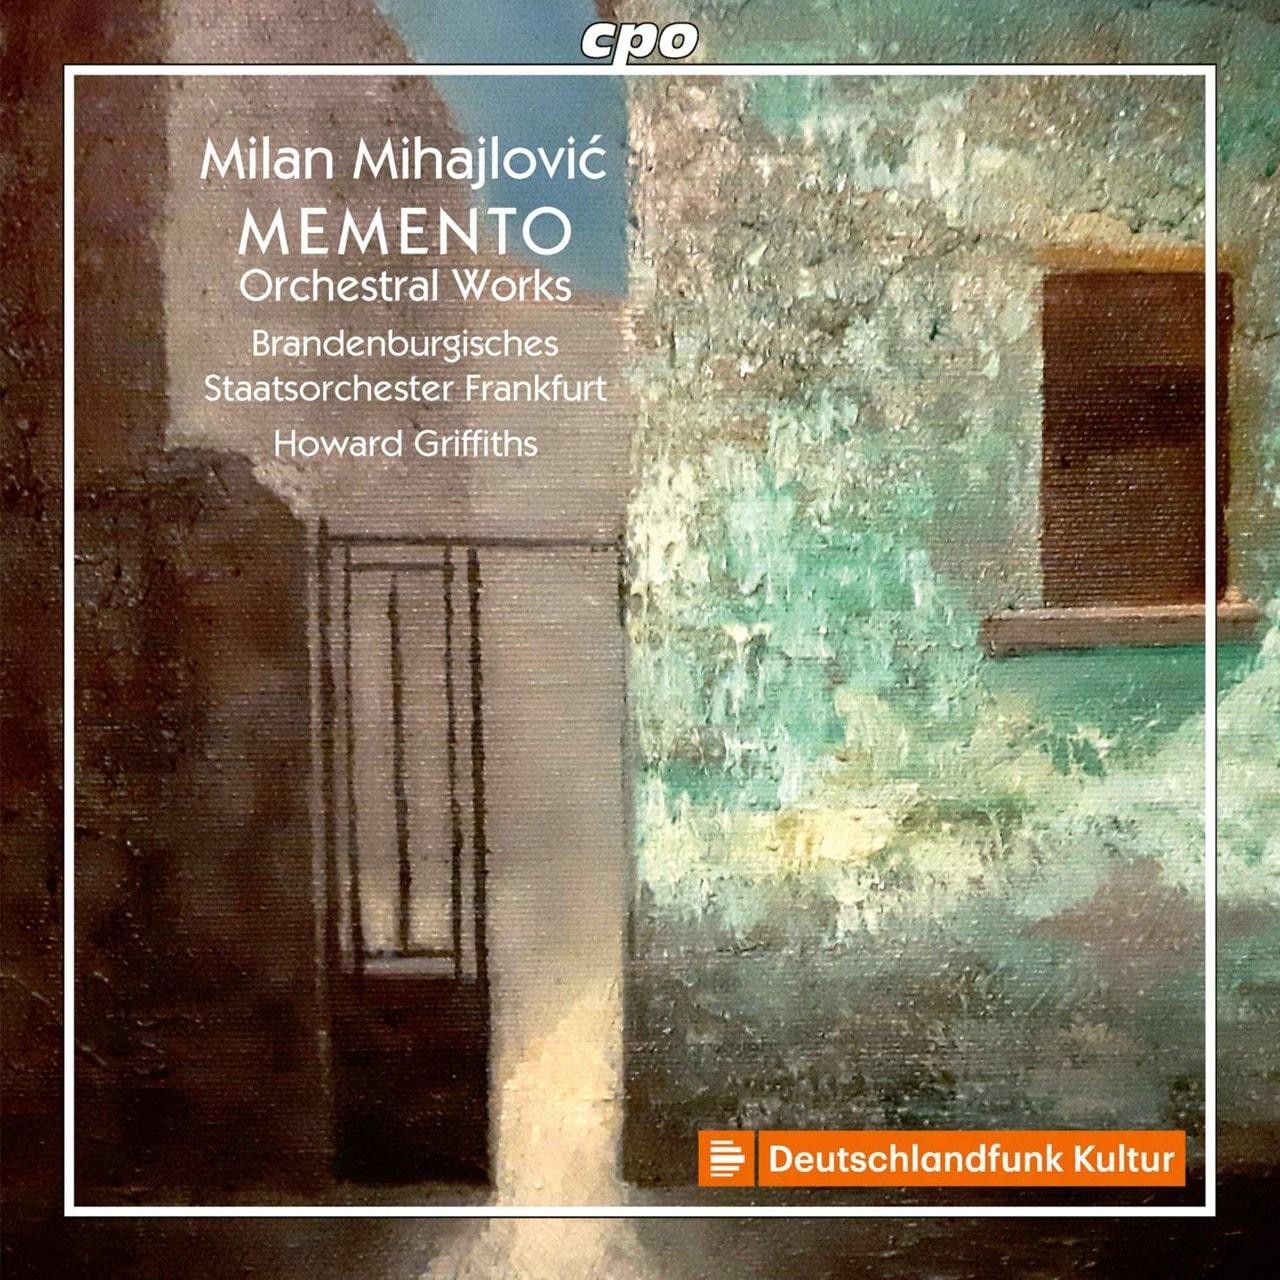 Milan Mihajlovic: Memento: Orchestral Works - 1